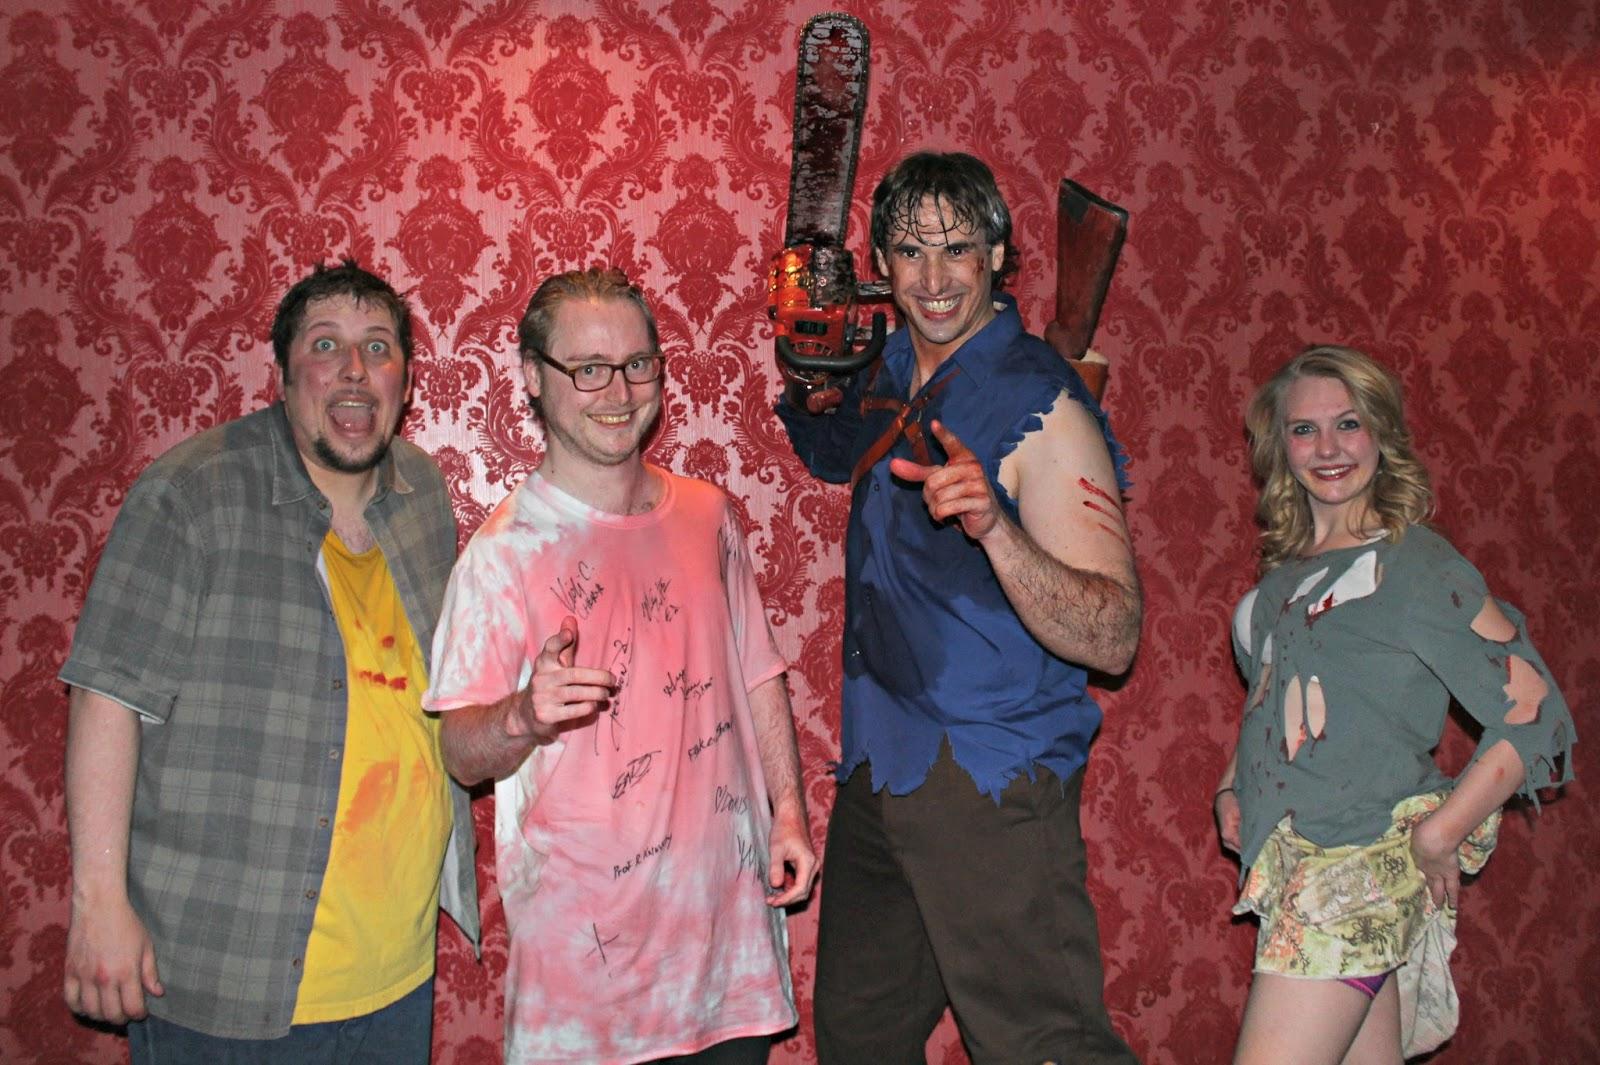 4594b10478e7 Evil Dead - The Musical (Ultimate 4D Las Vegas Experience) Review ...